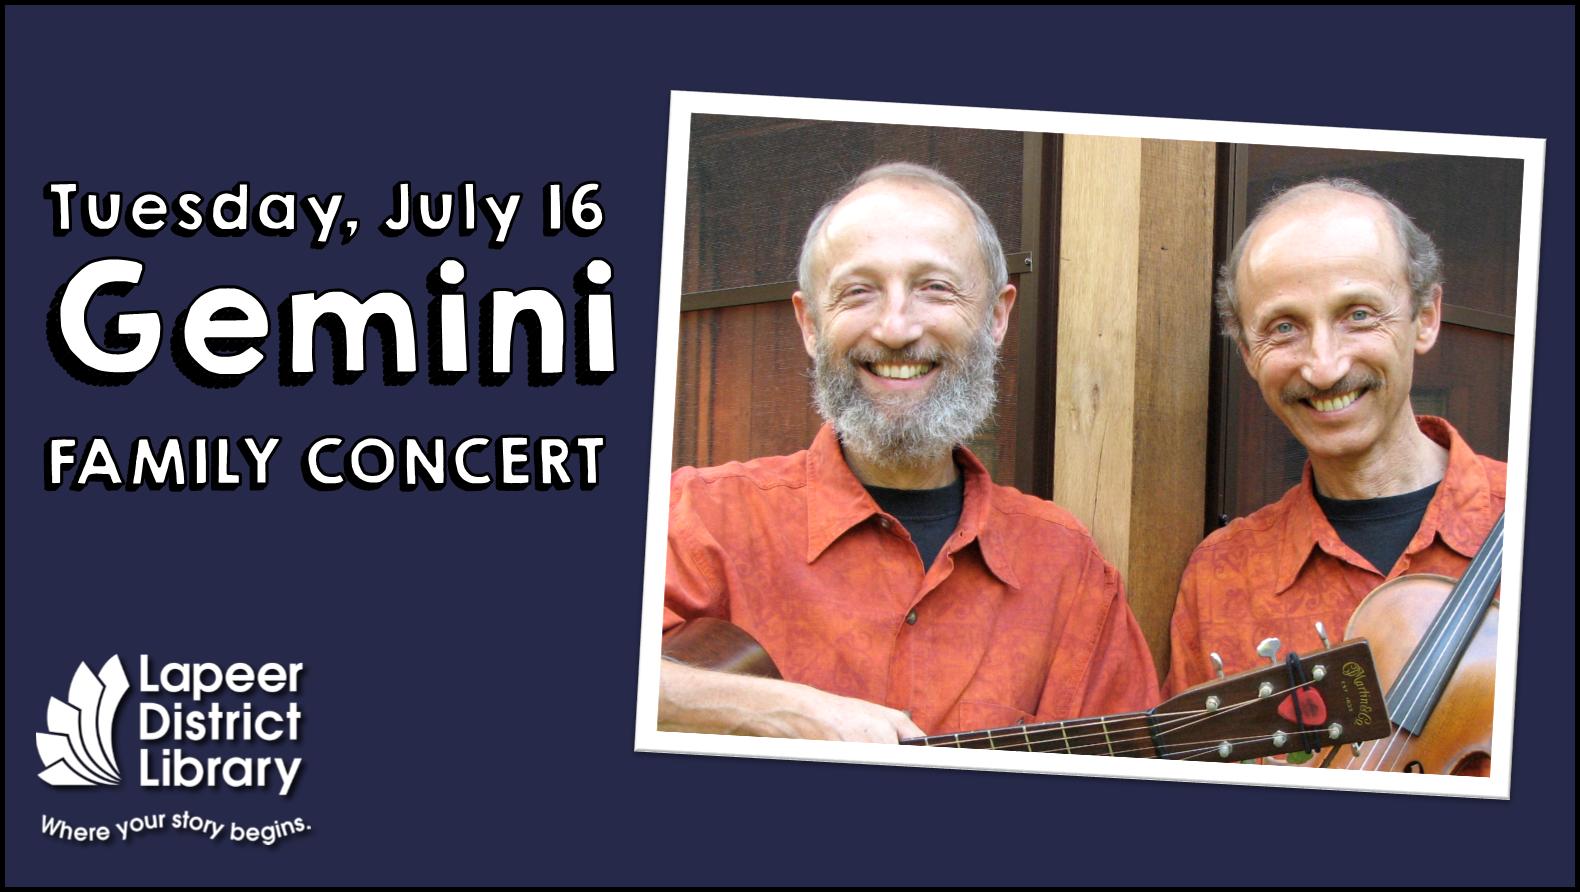 Gemini - Family Concert